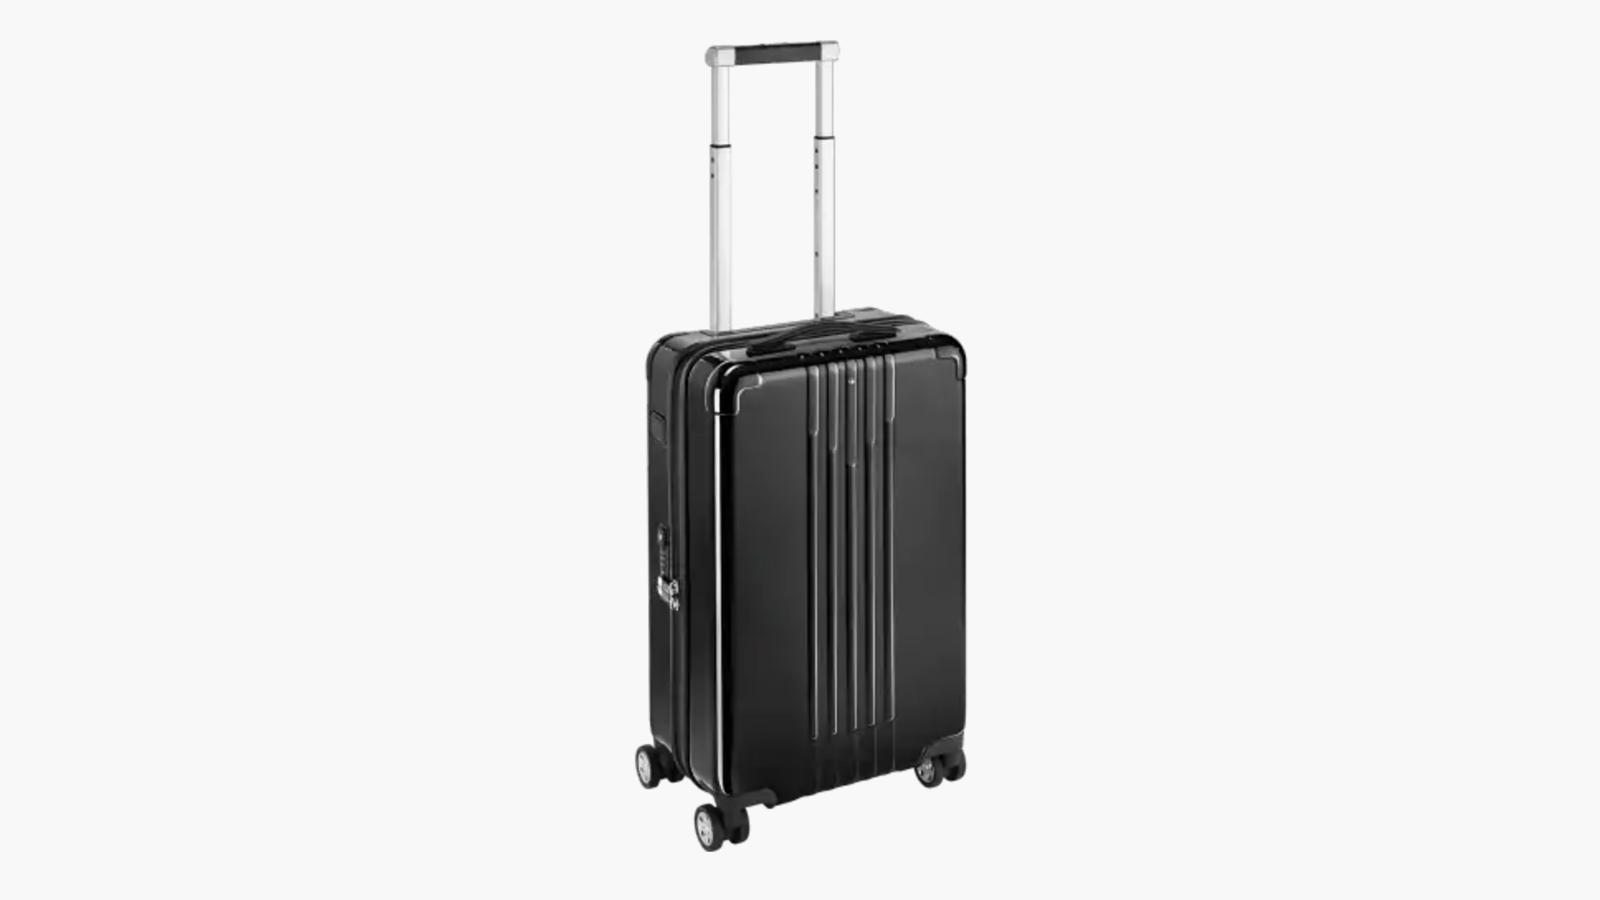 Montblanc MY4810 Luggage